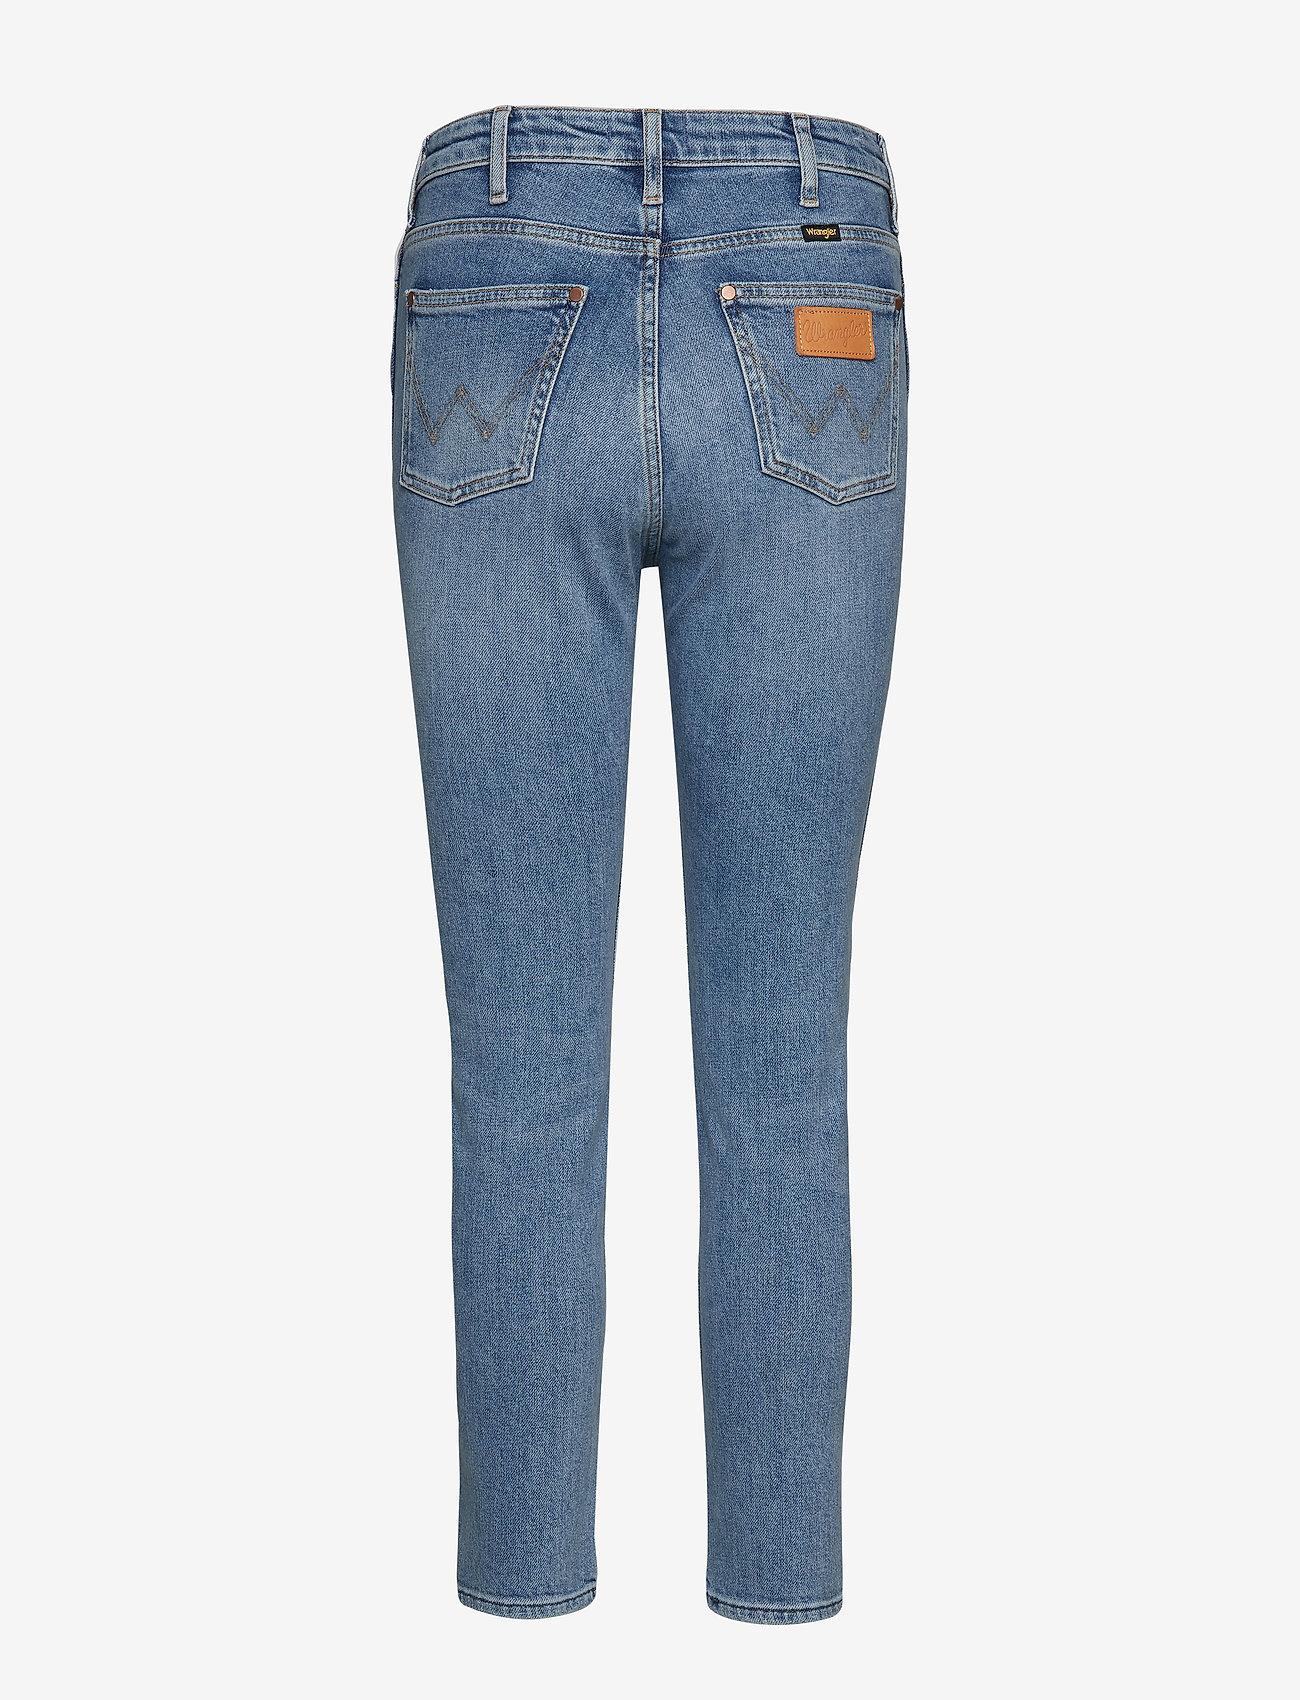 Wrangler - RETRO SKINNY - skinny jeans - blue hawaii